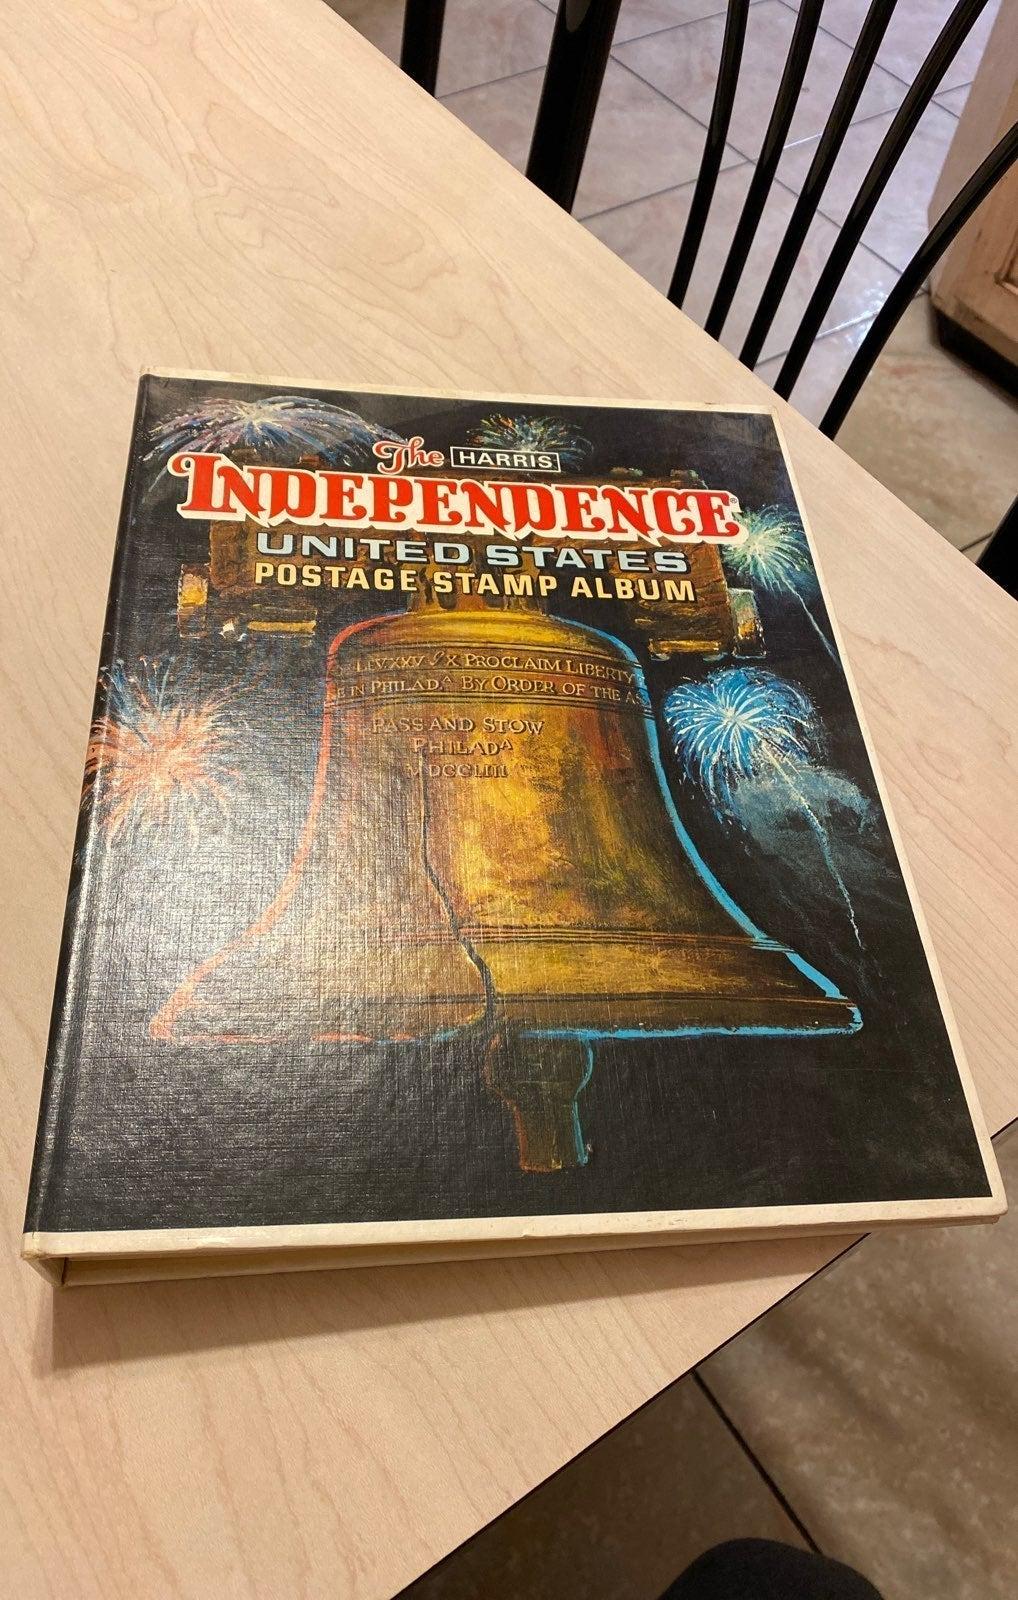 Independance U.S. Postage Stamp Album